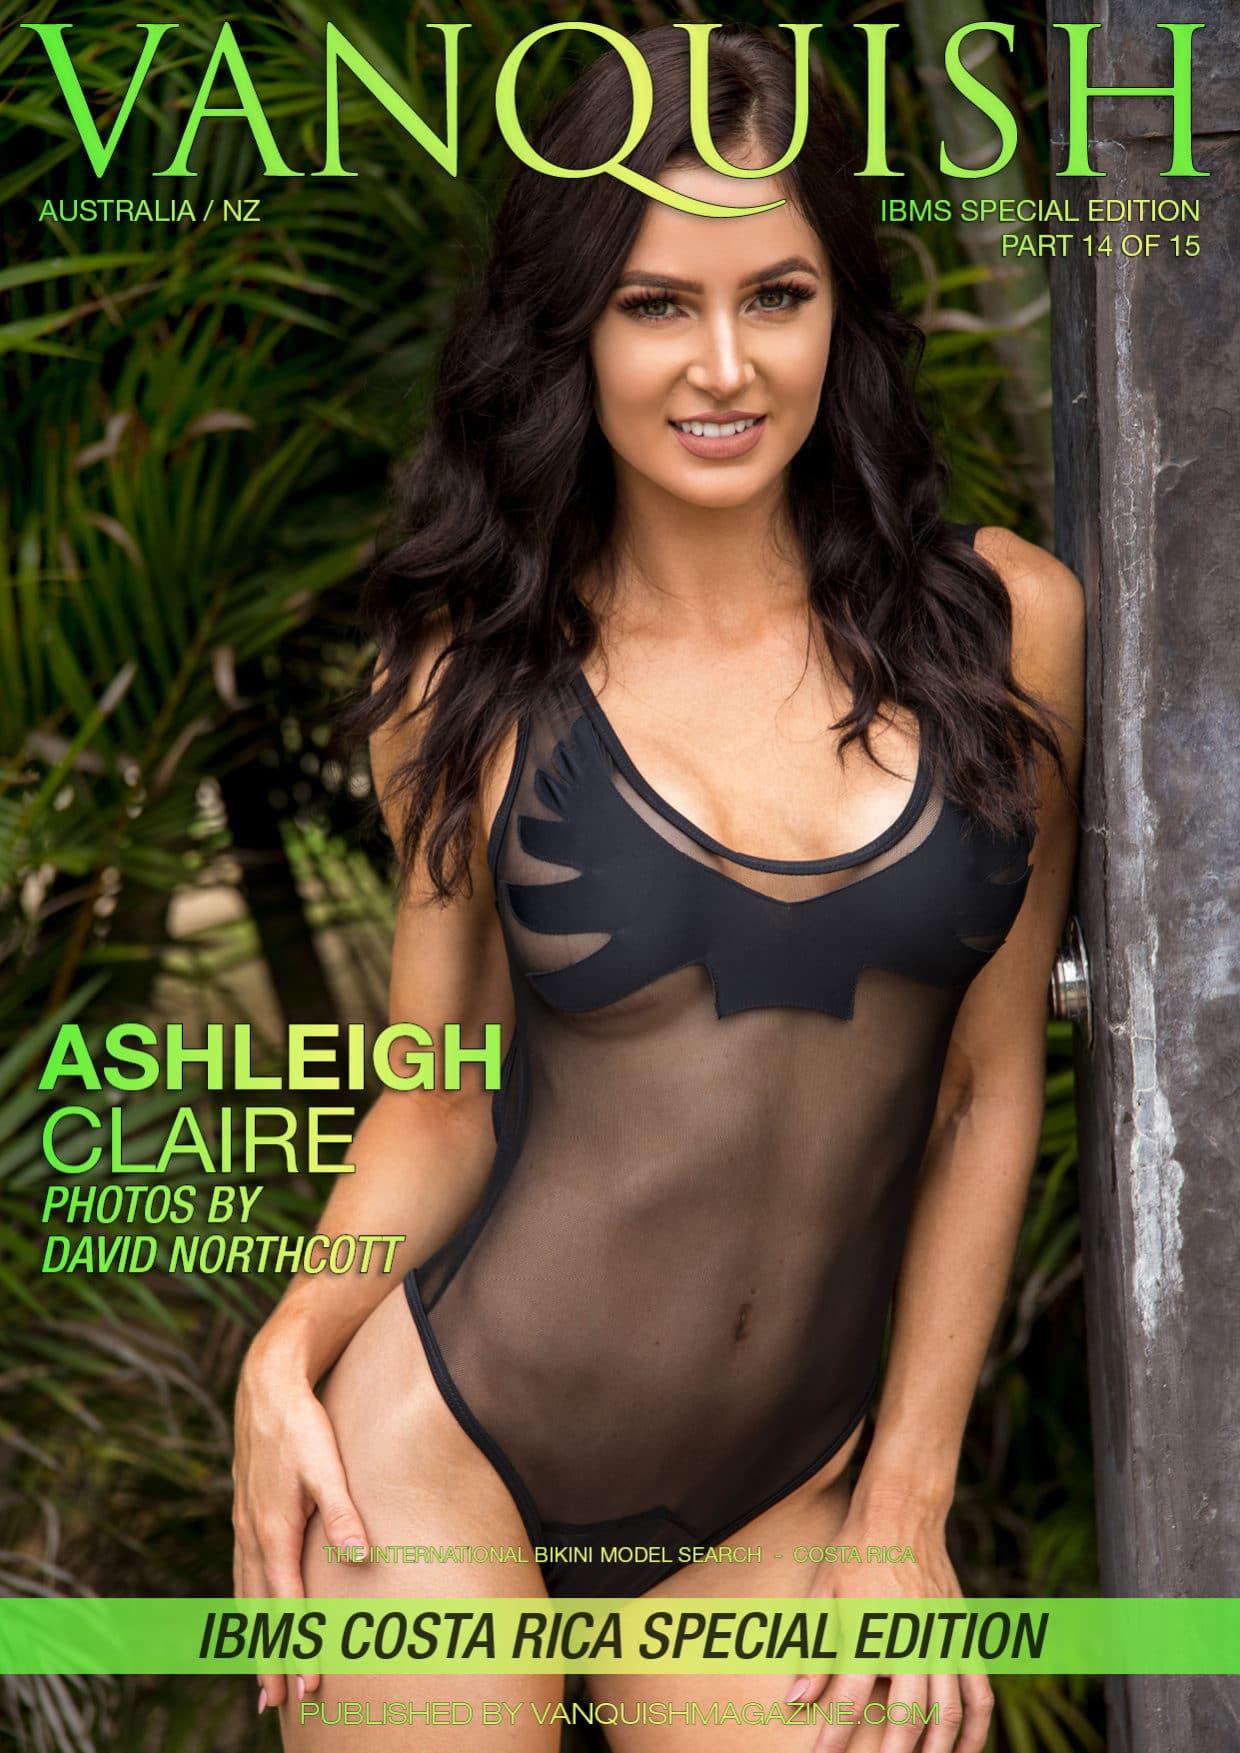 Vanquish Magazine - IBMS Costa Rica - Part 14 - Ashleigh Claire 1